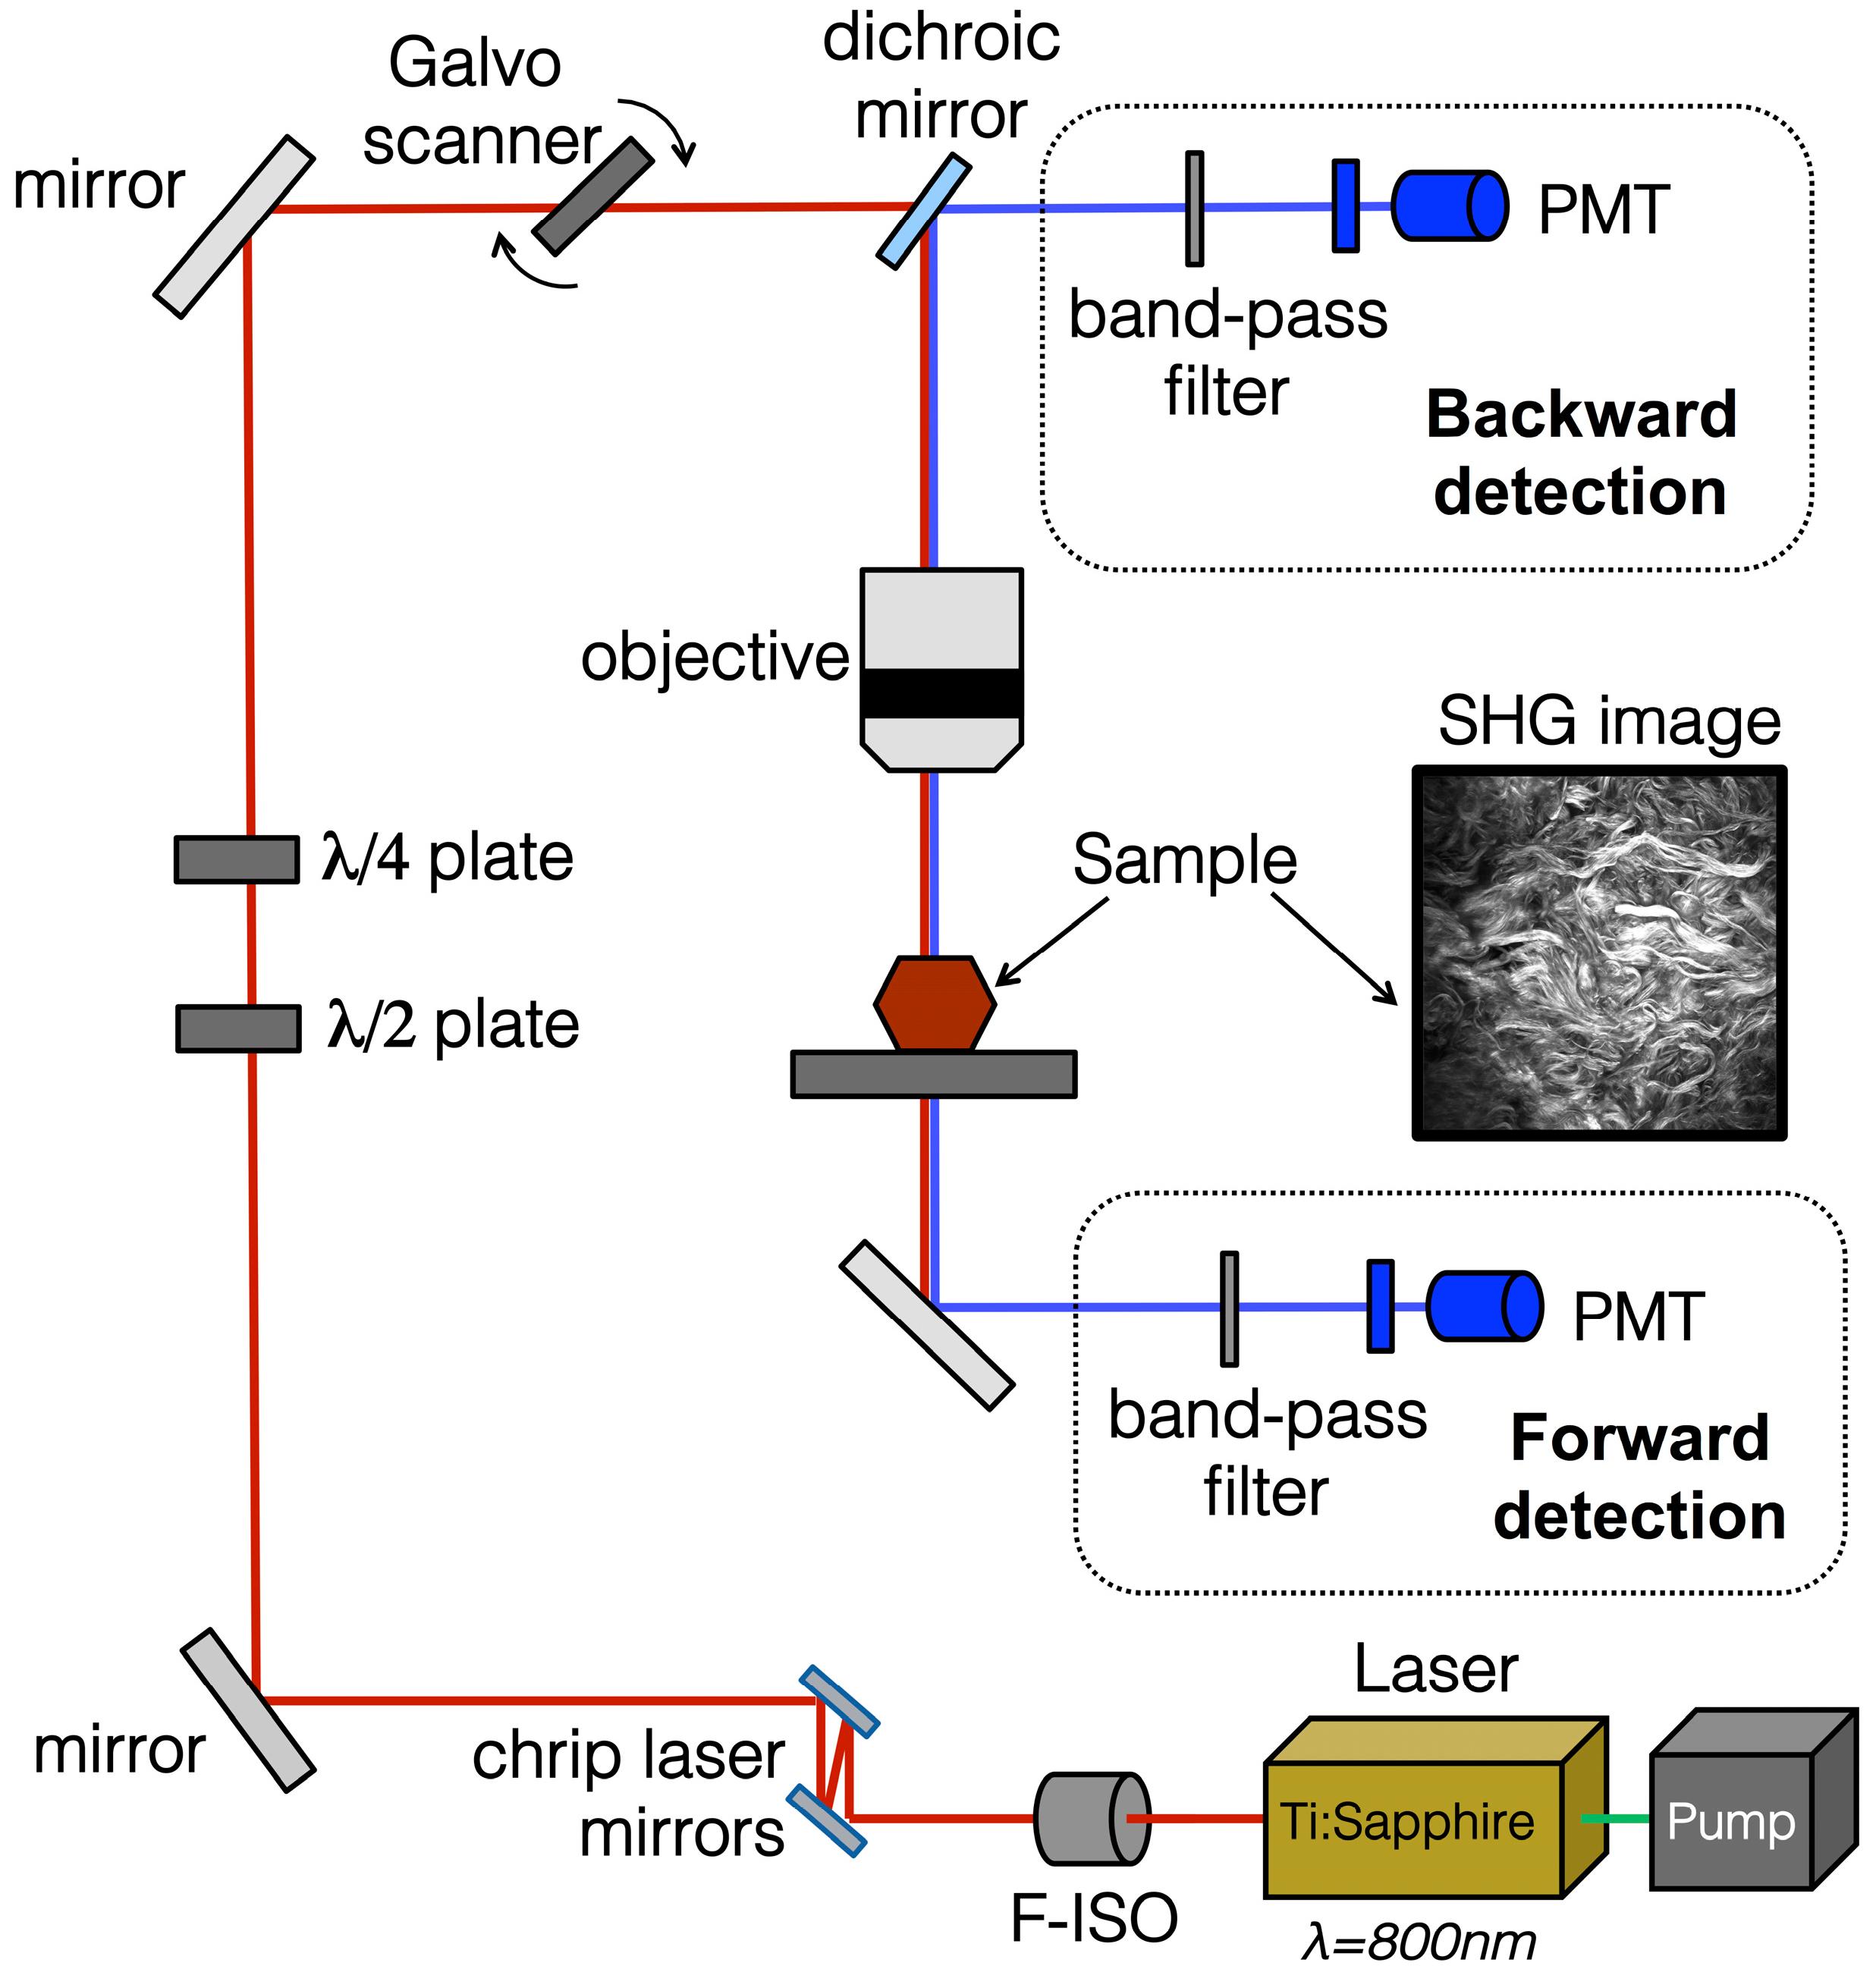 Ijms Free Full Text Imaging Collagen In Scar Tissue Basic Wiring Schematics Power King 1620 18 01772 G004